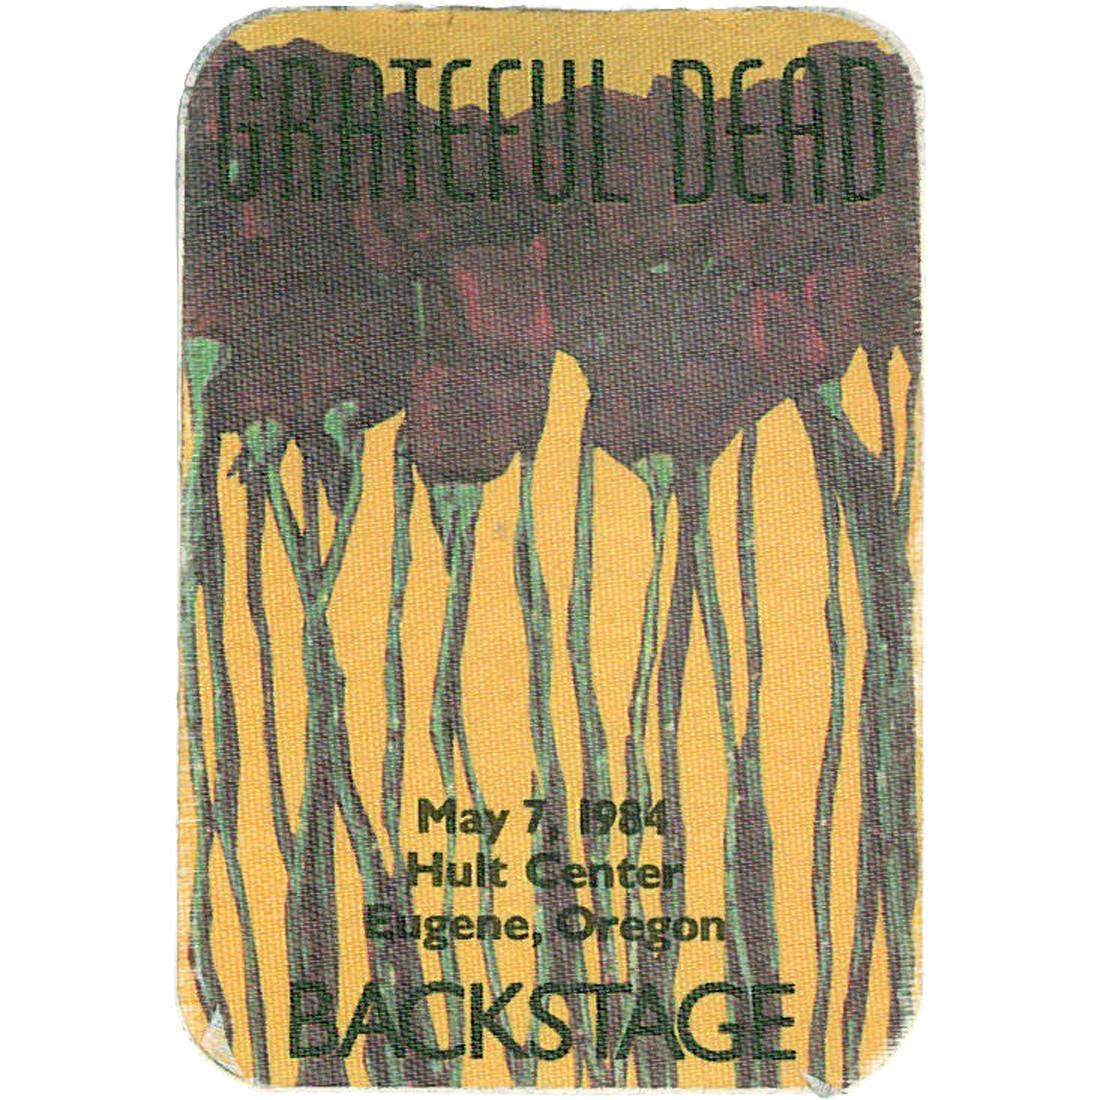 Grateful Dead 1984 05-07 Backstage Pass